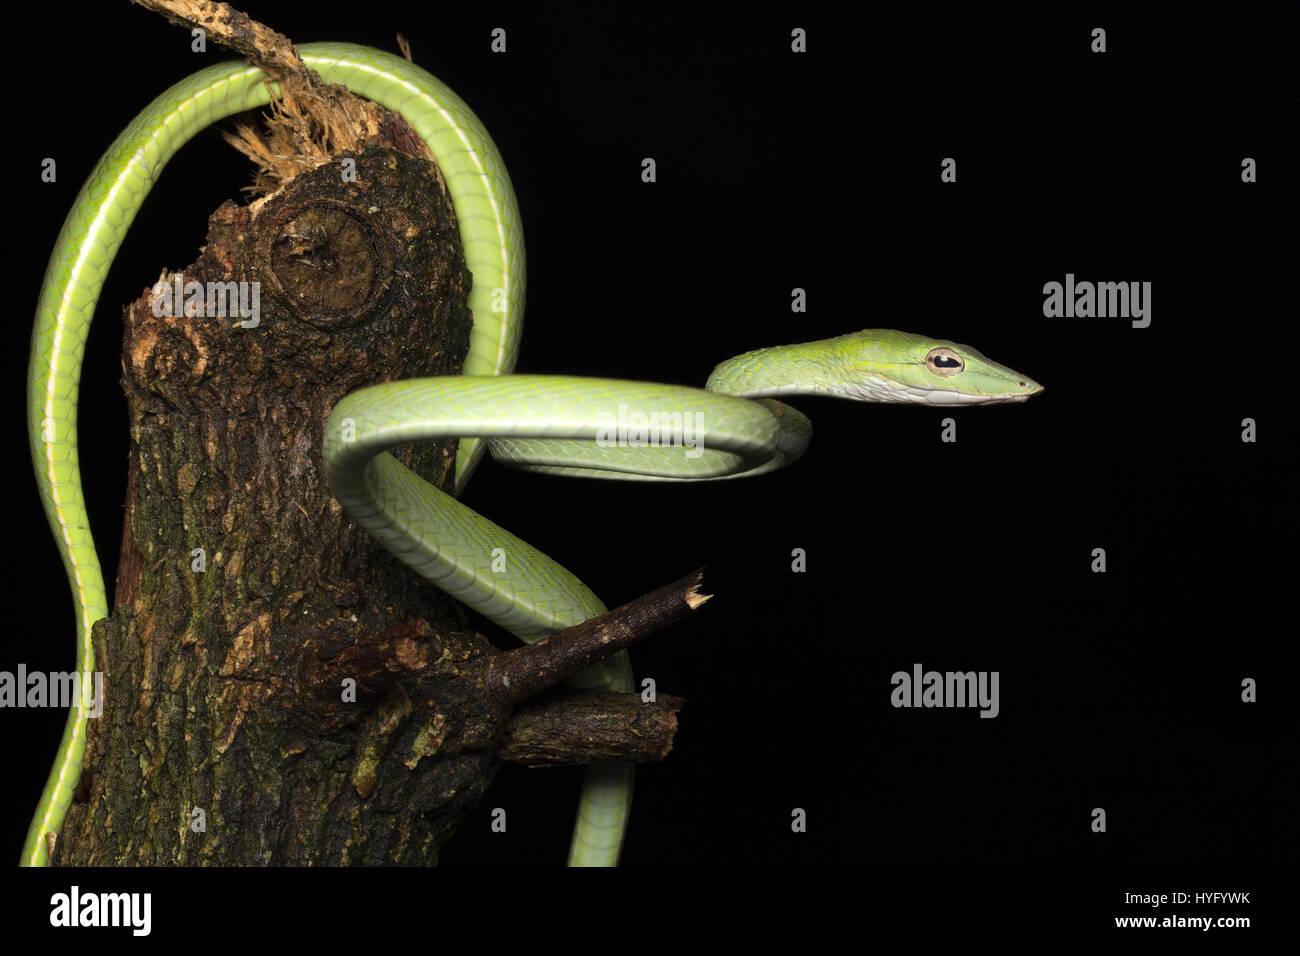 Whipsnake Oriental, Oriental, Serpent de vigne Banque D'Images